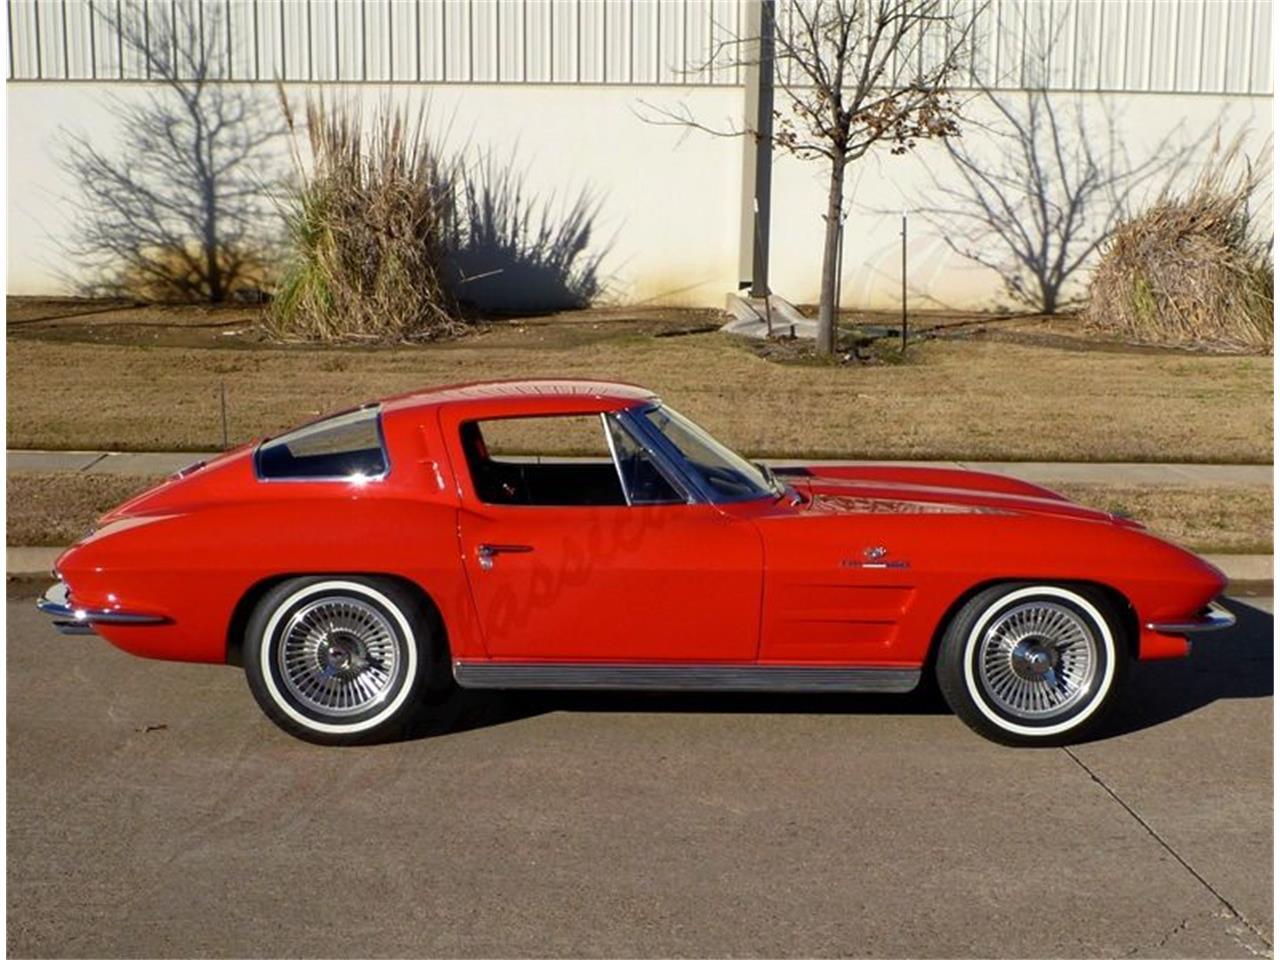 for sale 1963 chevrolet corvette split window in arlington texas. Cars Review. Best American Auto & Cars Review